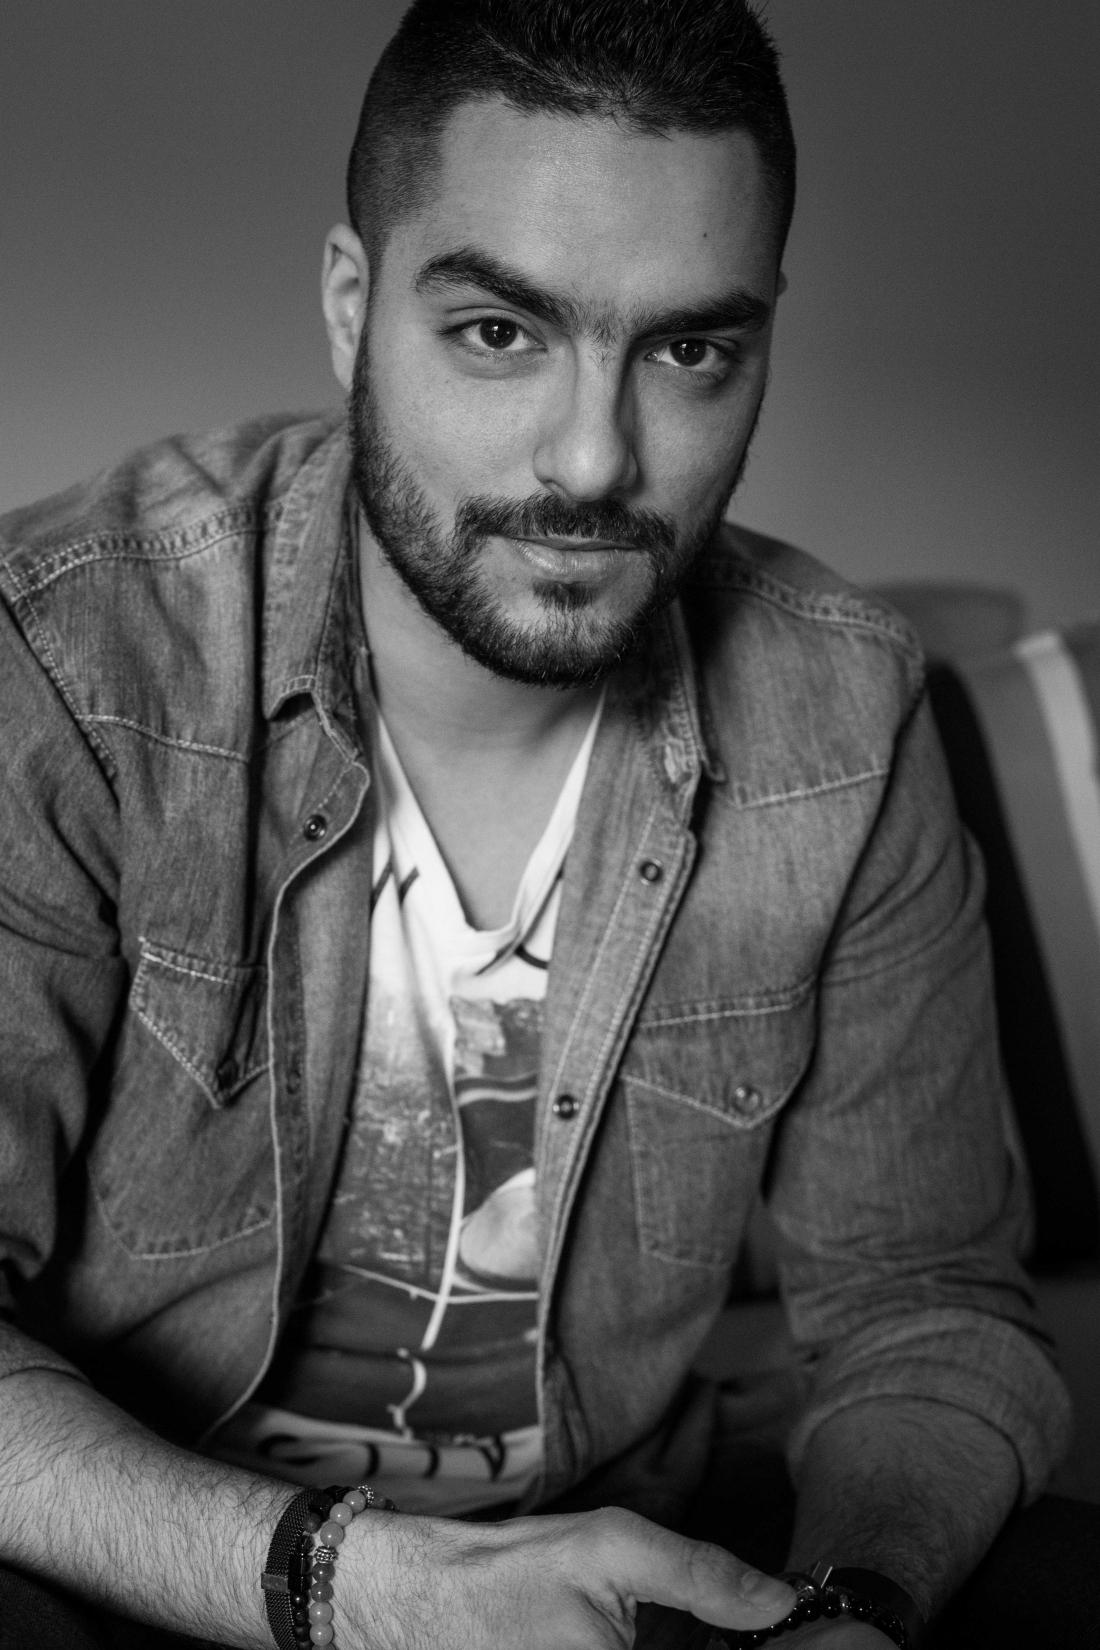 Hassan Elshafie